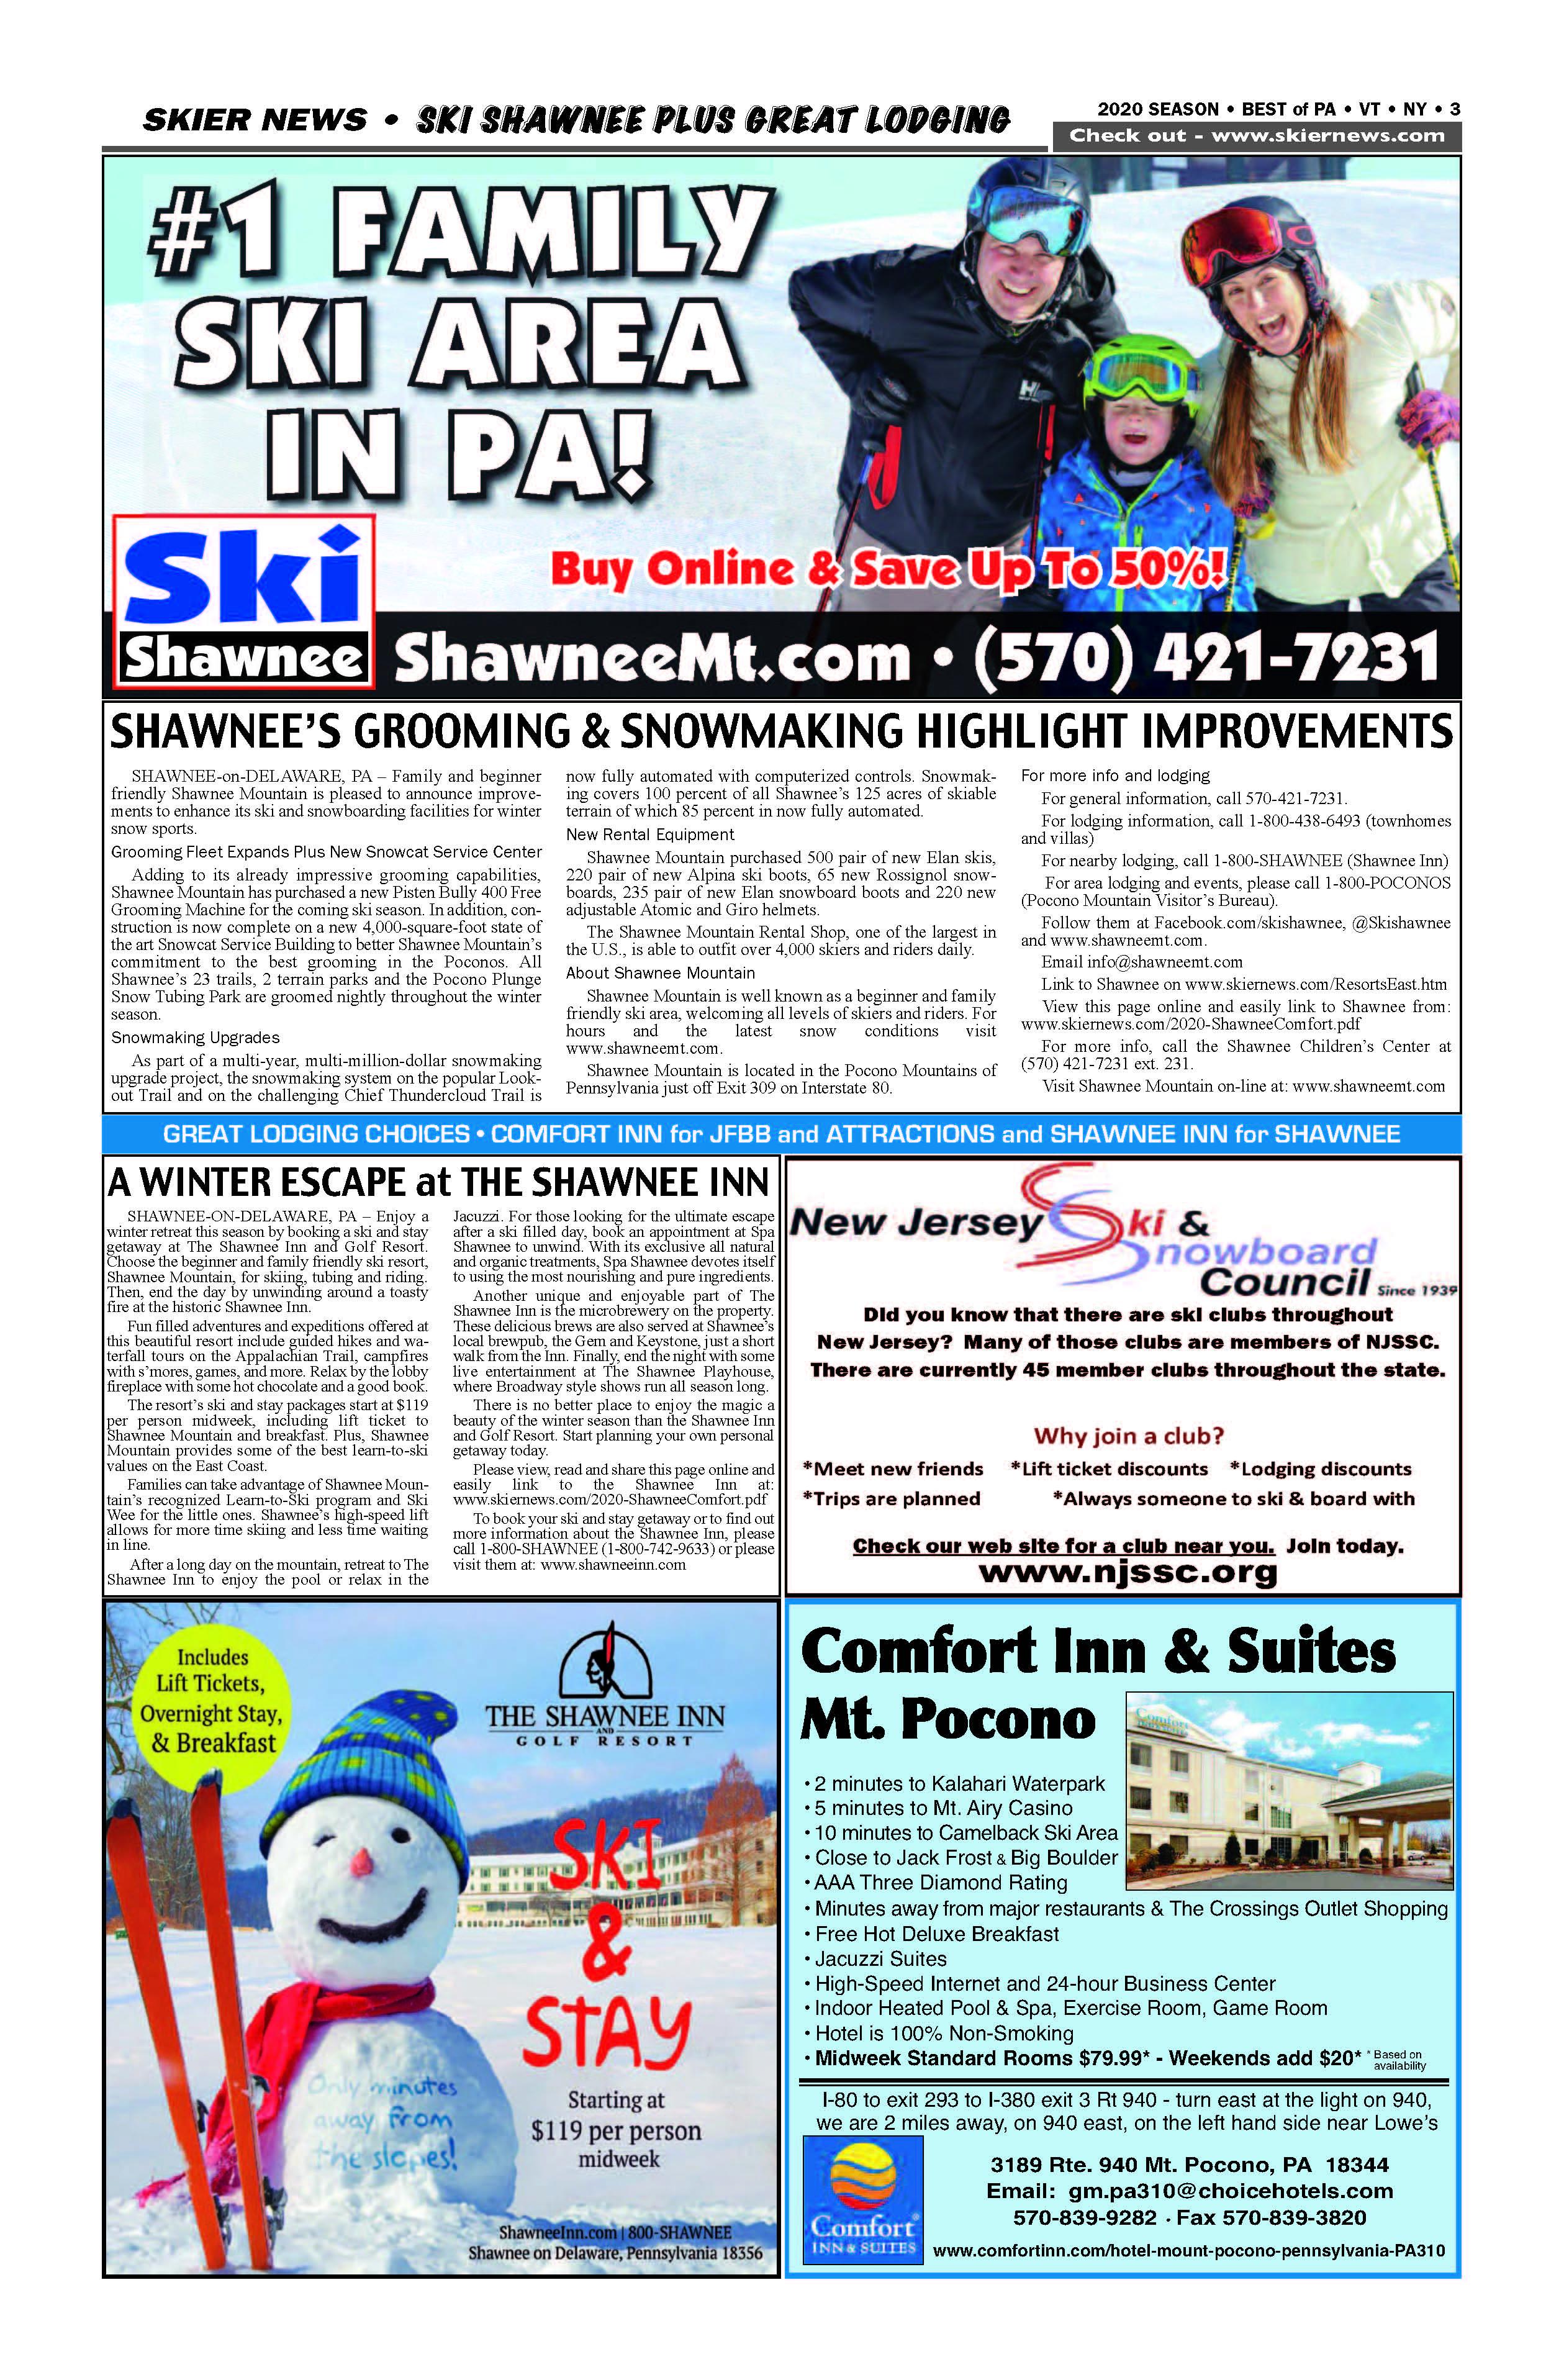 Shawnee & Shawnee Inn